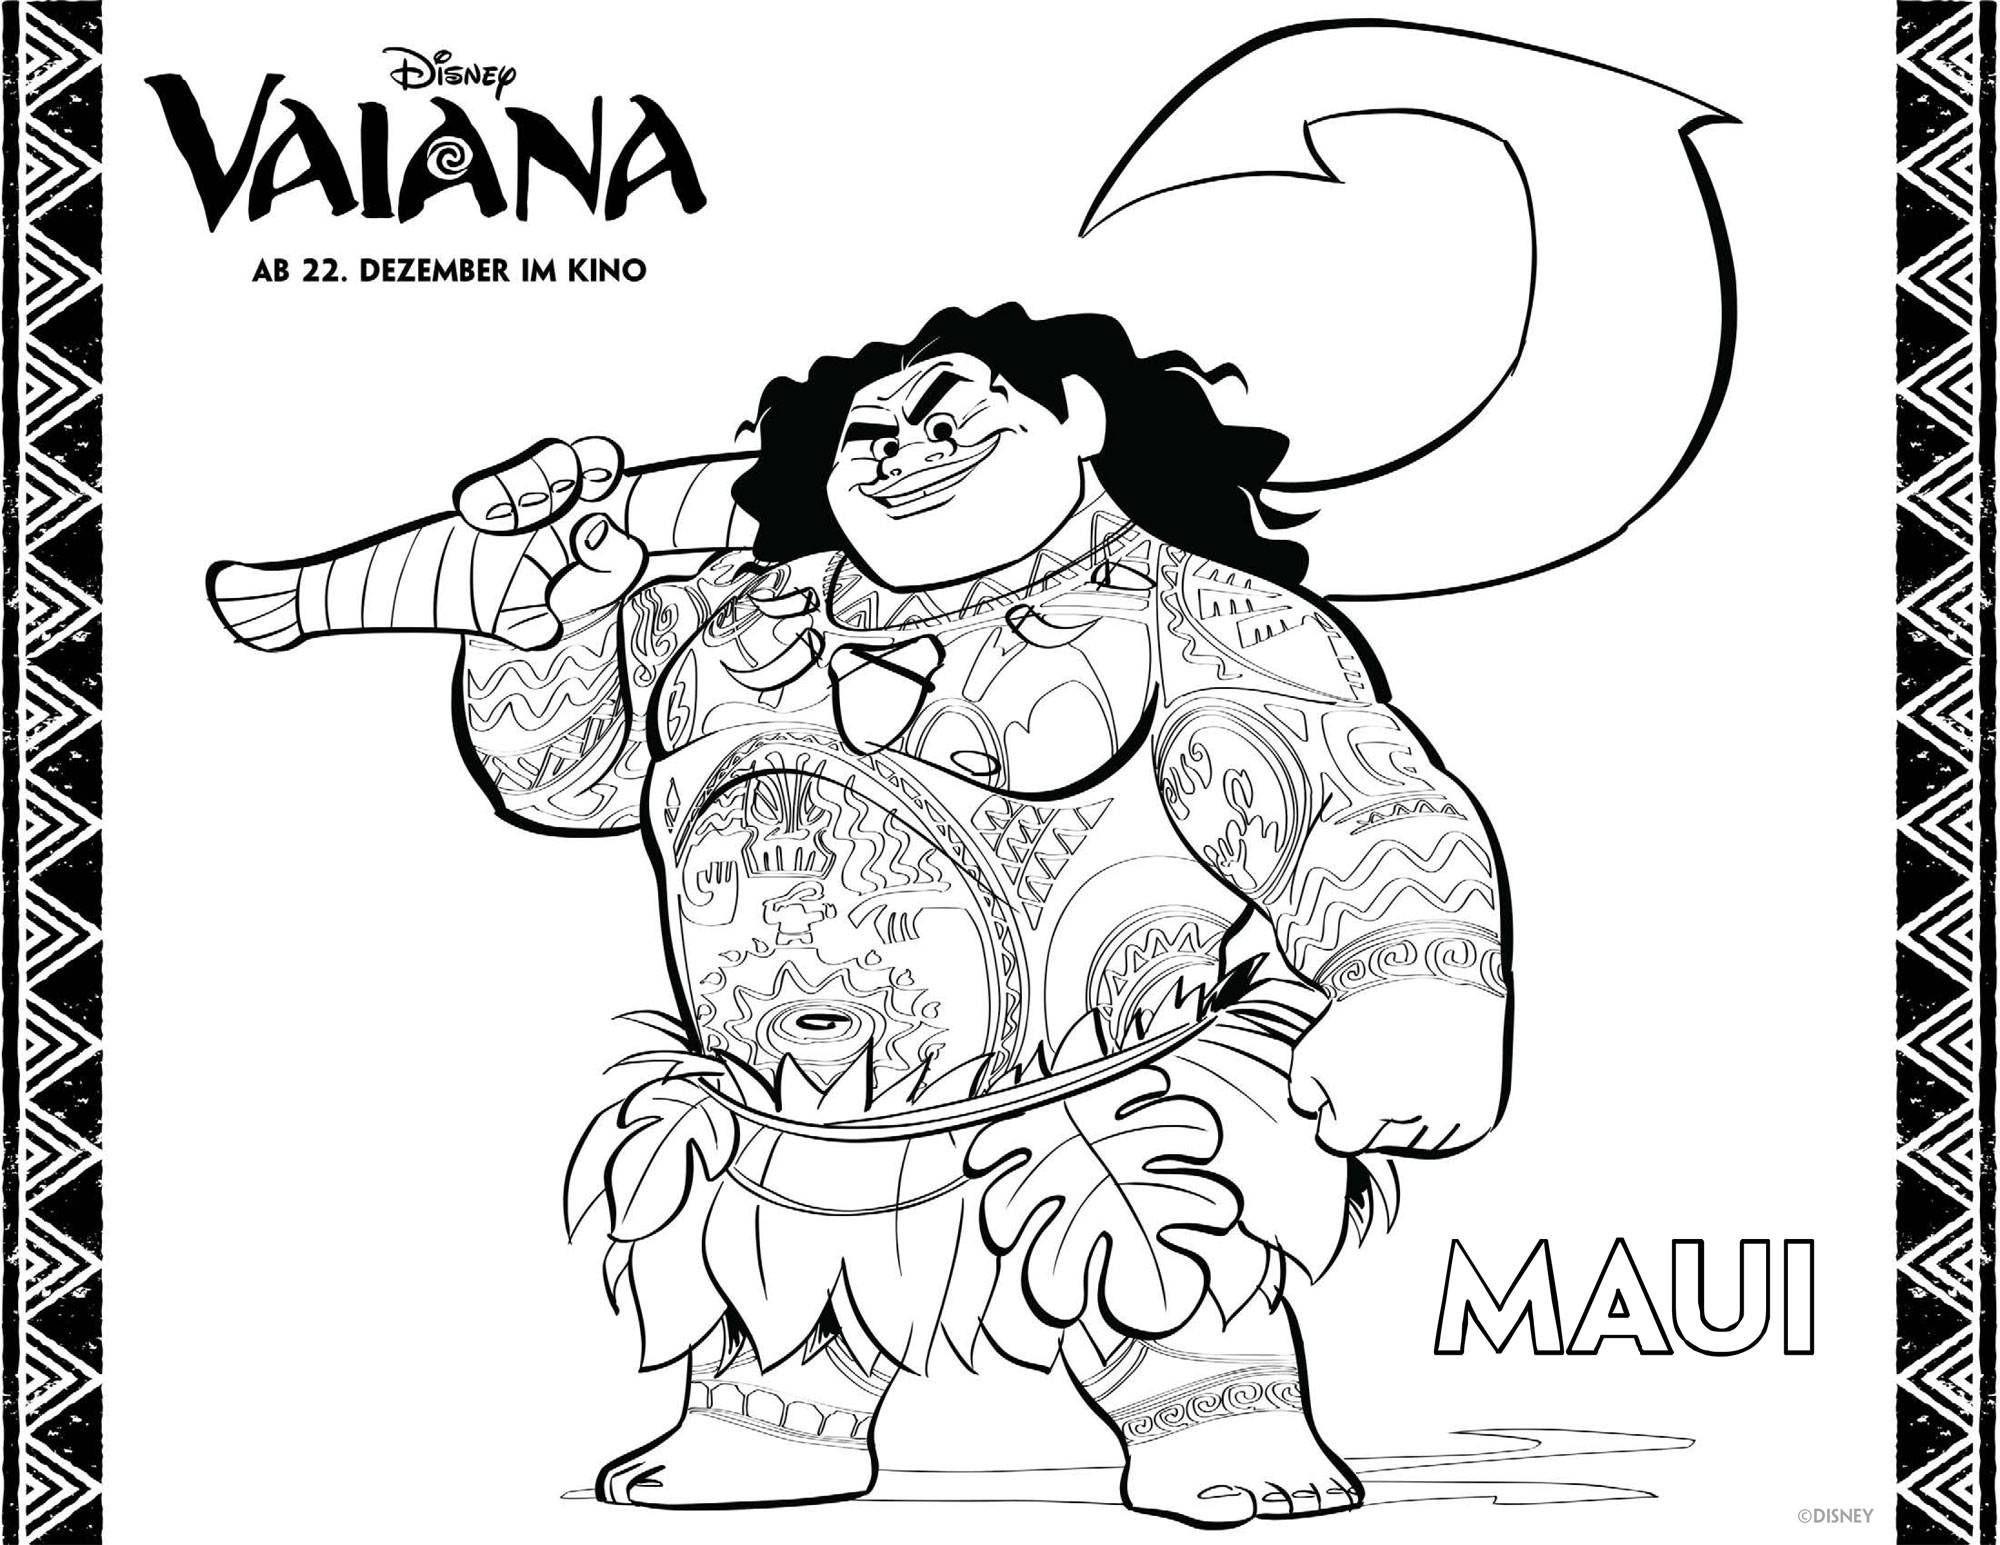 The Legend Of Zelda Ausmalbilder Inspirierend Ausmalbilder Vaiana Maui Ausmalen Ausmalbilder Luxus Ariel Fotos